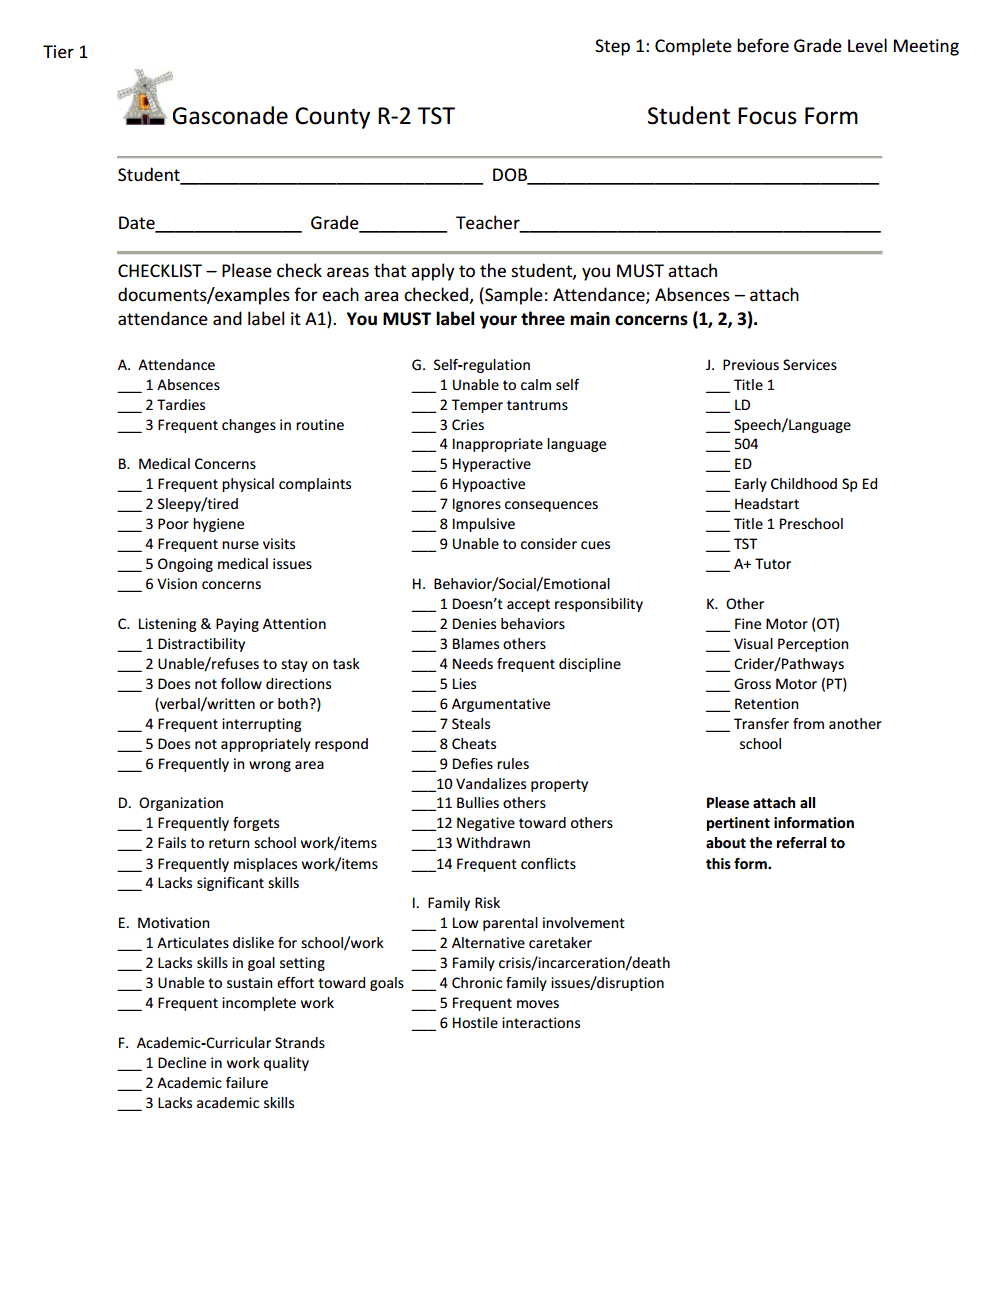 Student Focus Form Step 1.pdf Student focus, Teacher